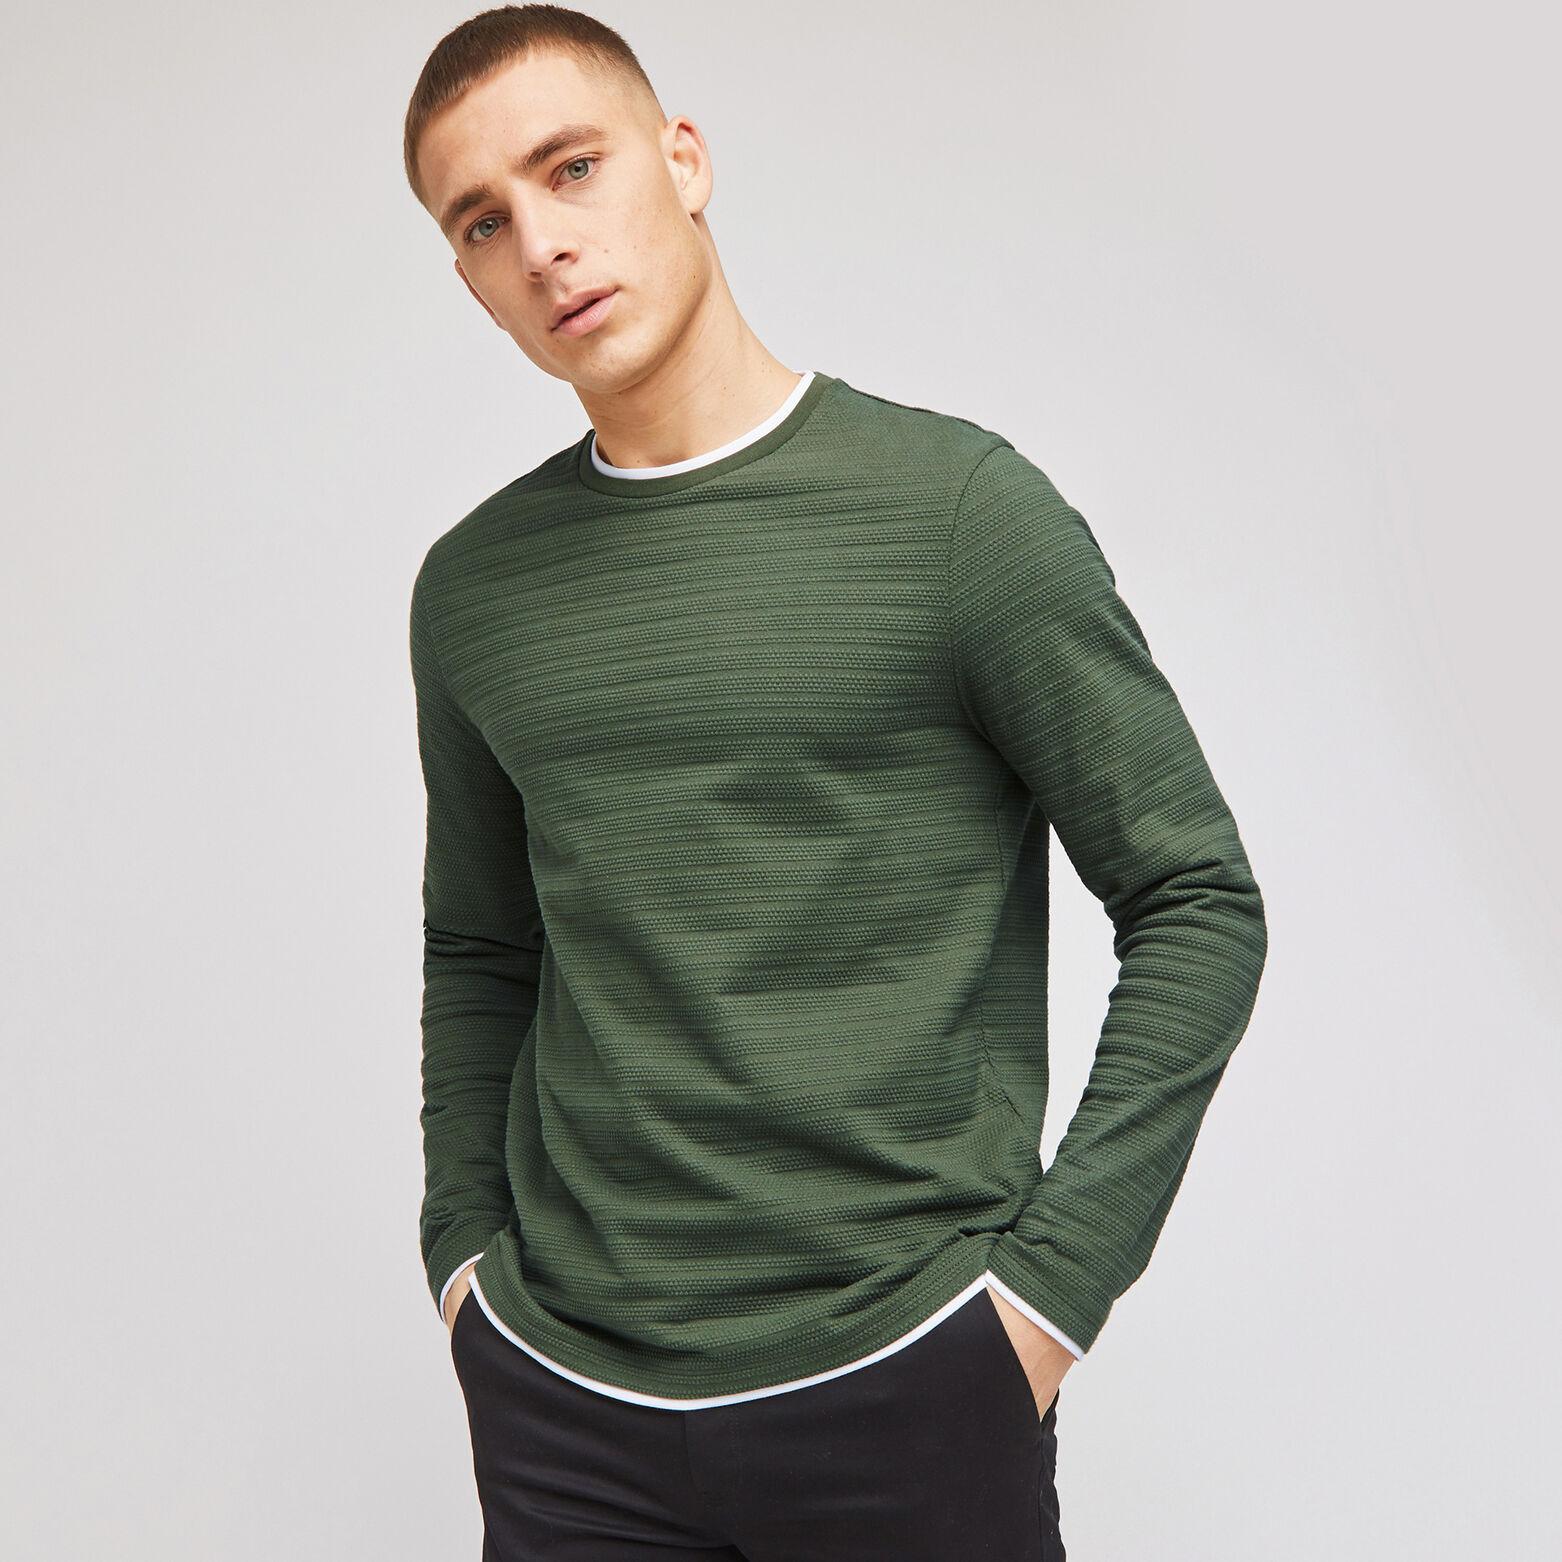 Tee-shirt matière reliéfée 2 en 1